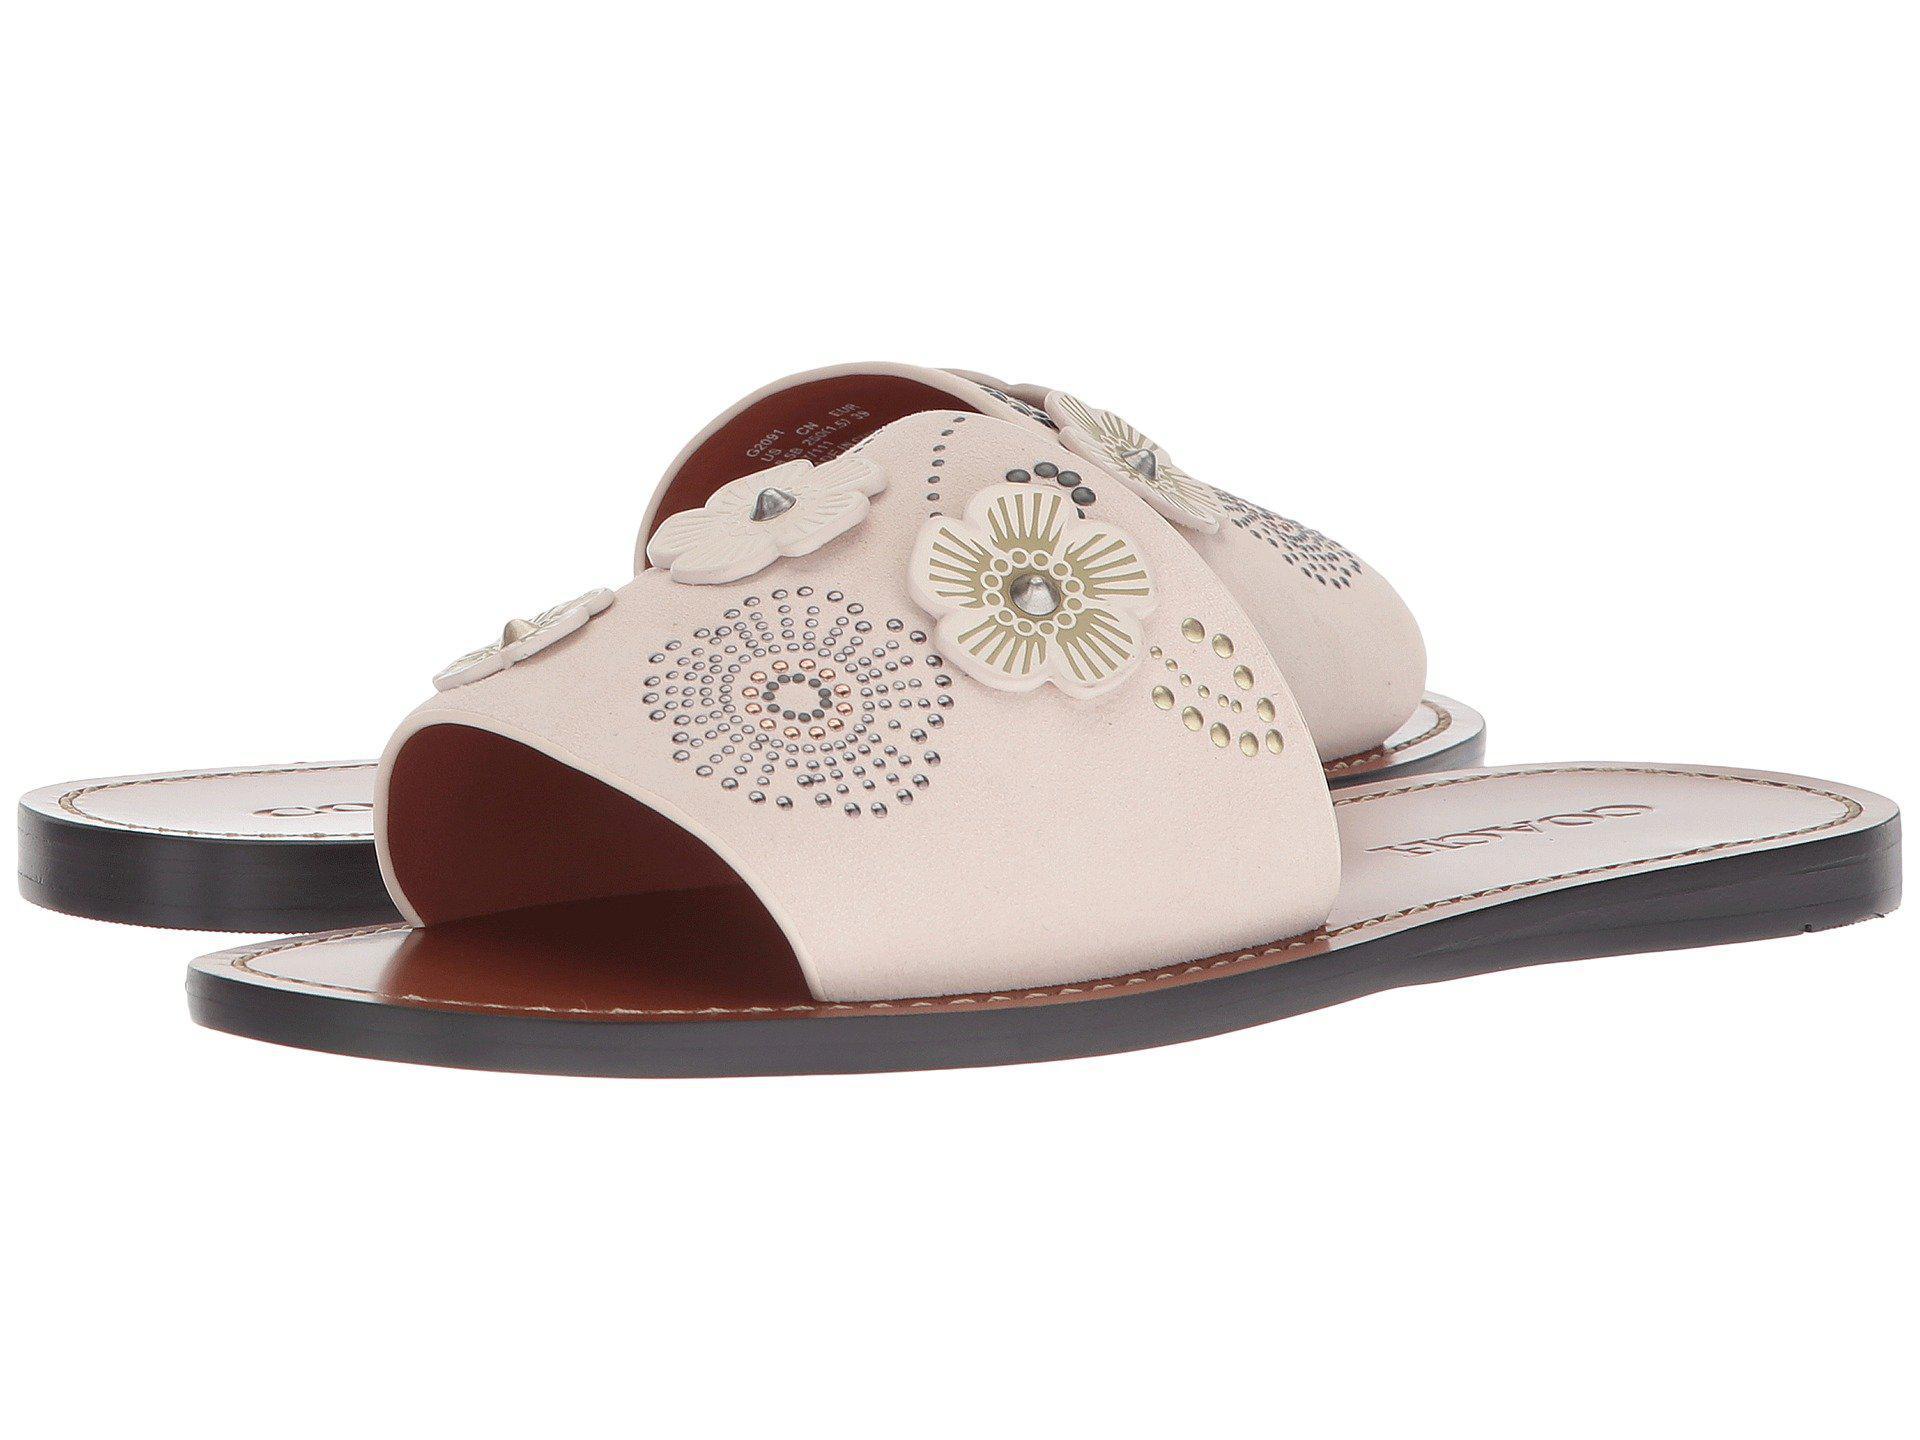 84b38126c099 Lyst coach tea rose rivet slide chalk suede womens slide shoes jpg  1920x1440 Coach slide sandals